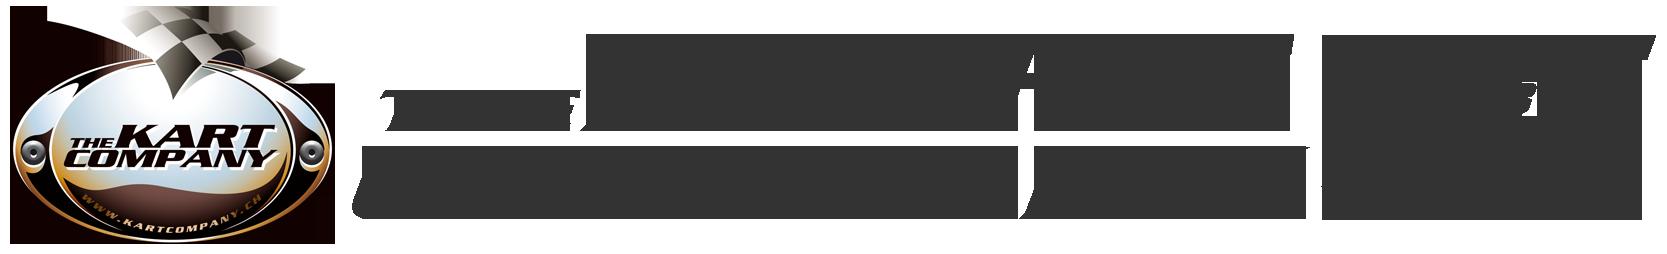 Kart Company Shop